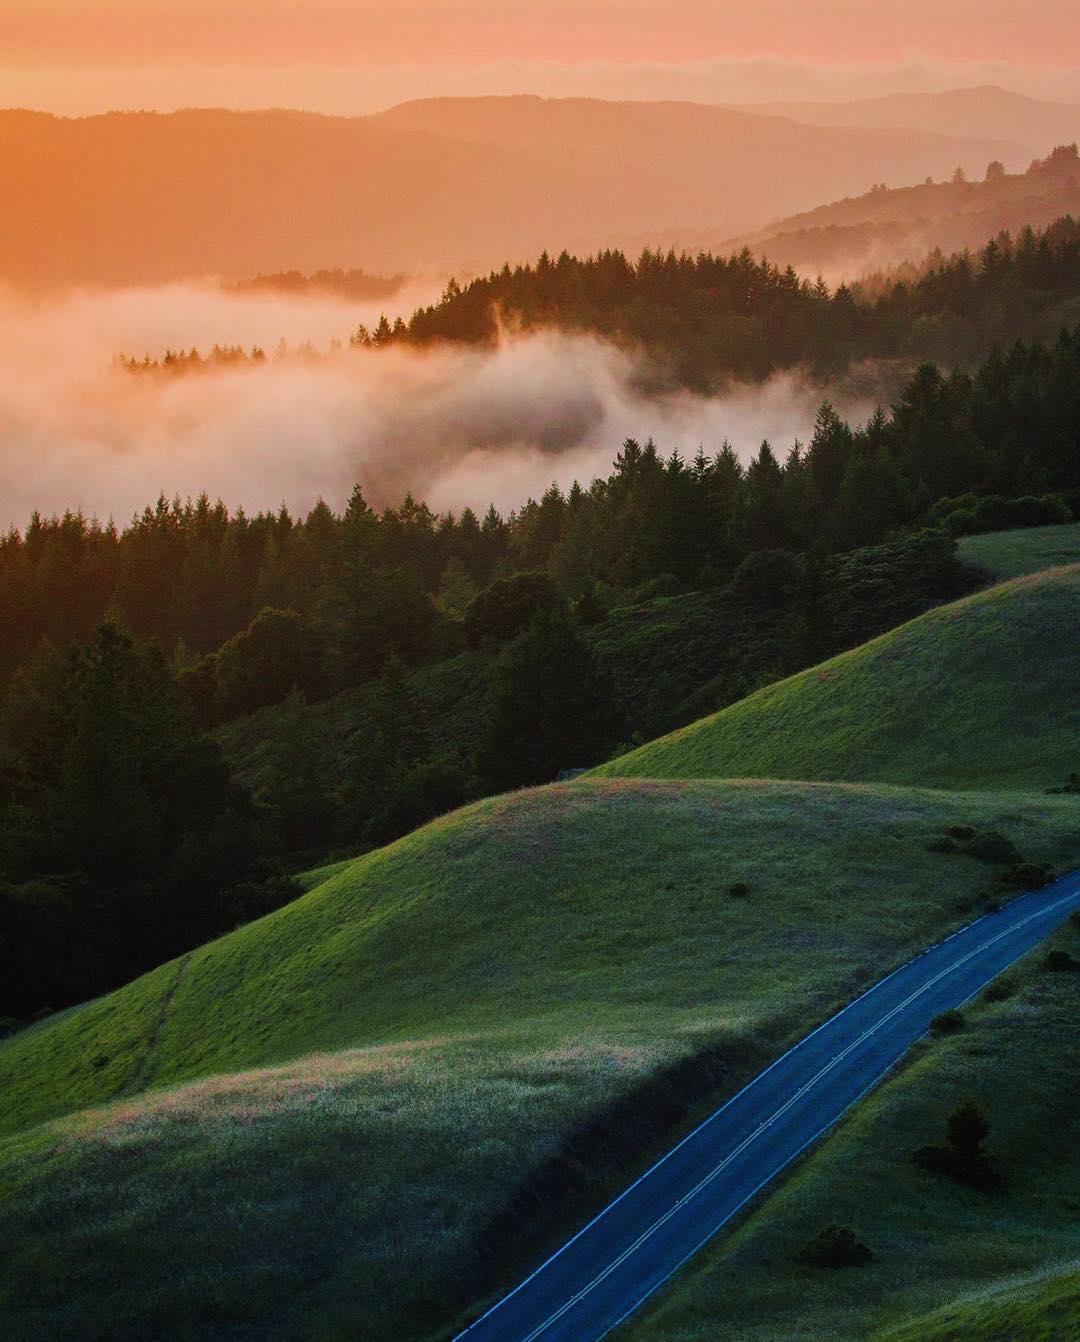 Потрясающие пейзажи от Сэма Хорина